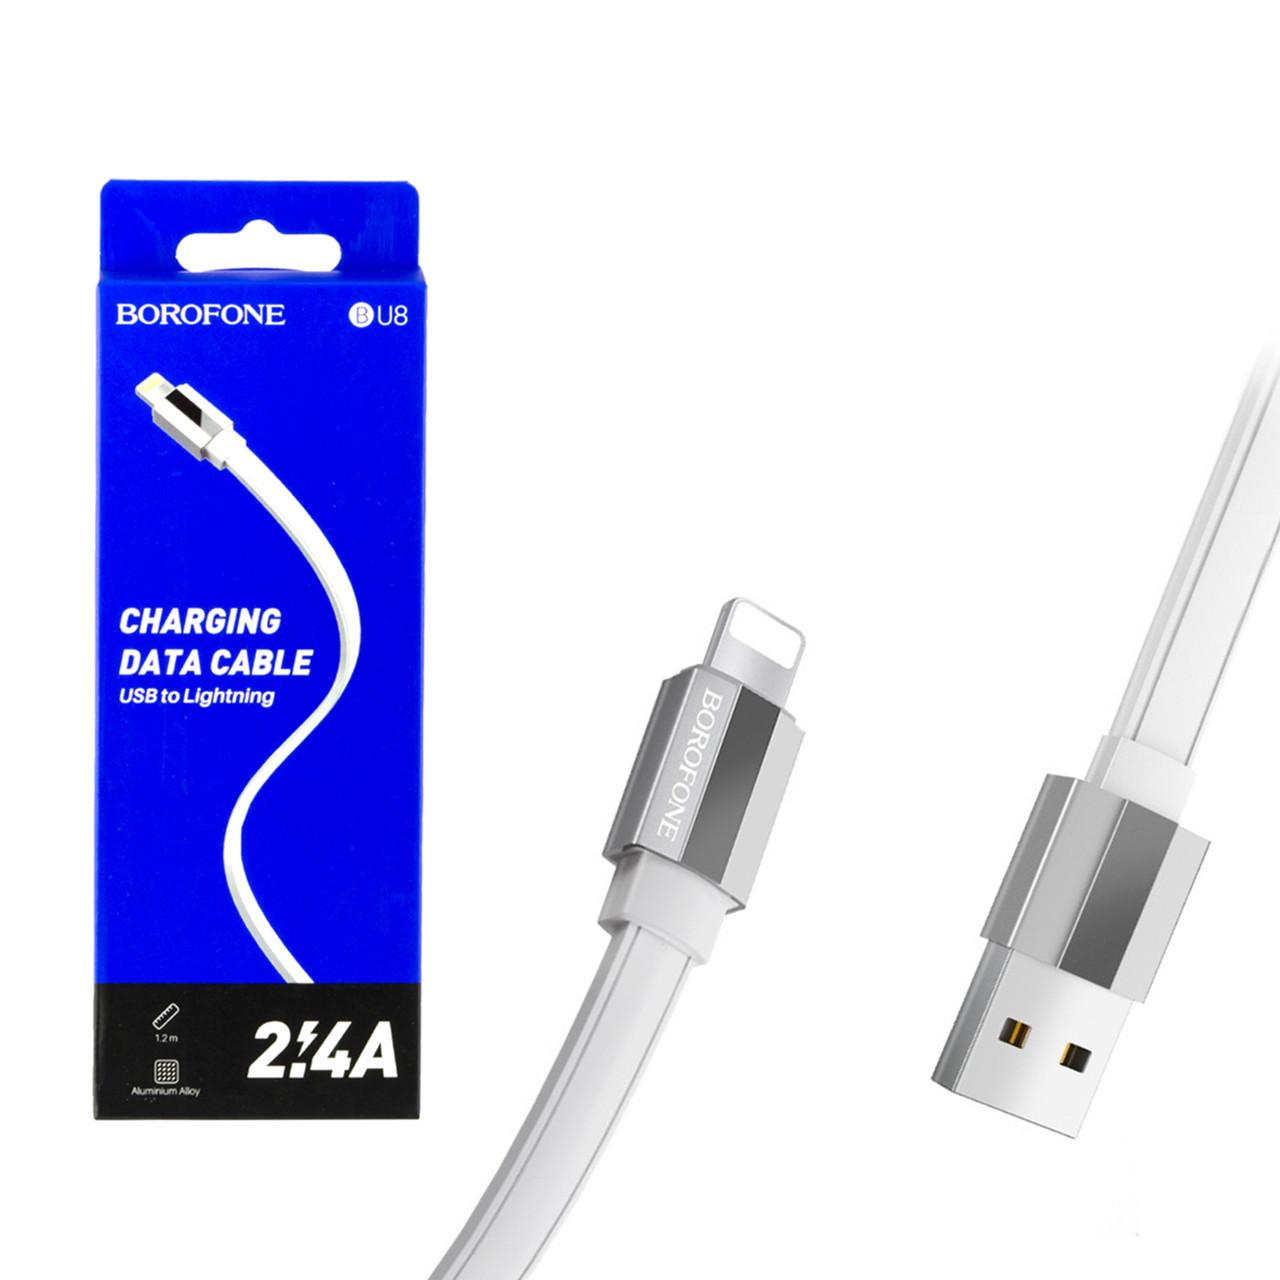 Кабель Apple lightning Borofone BU8 1.2m, White